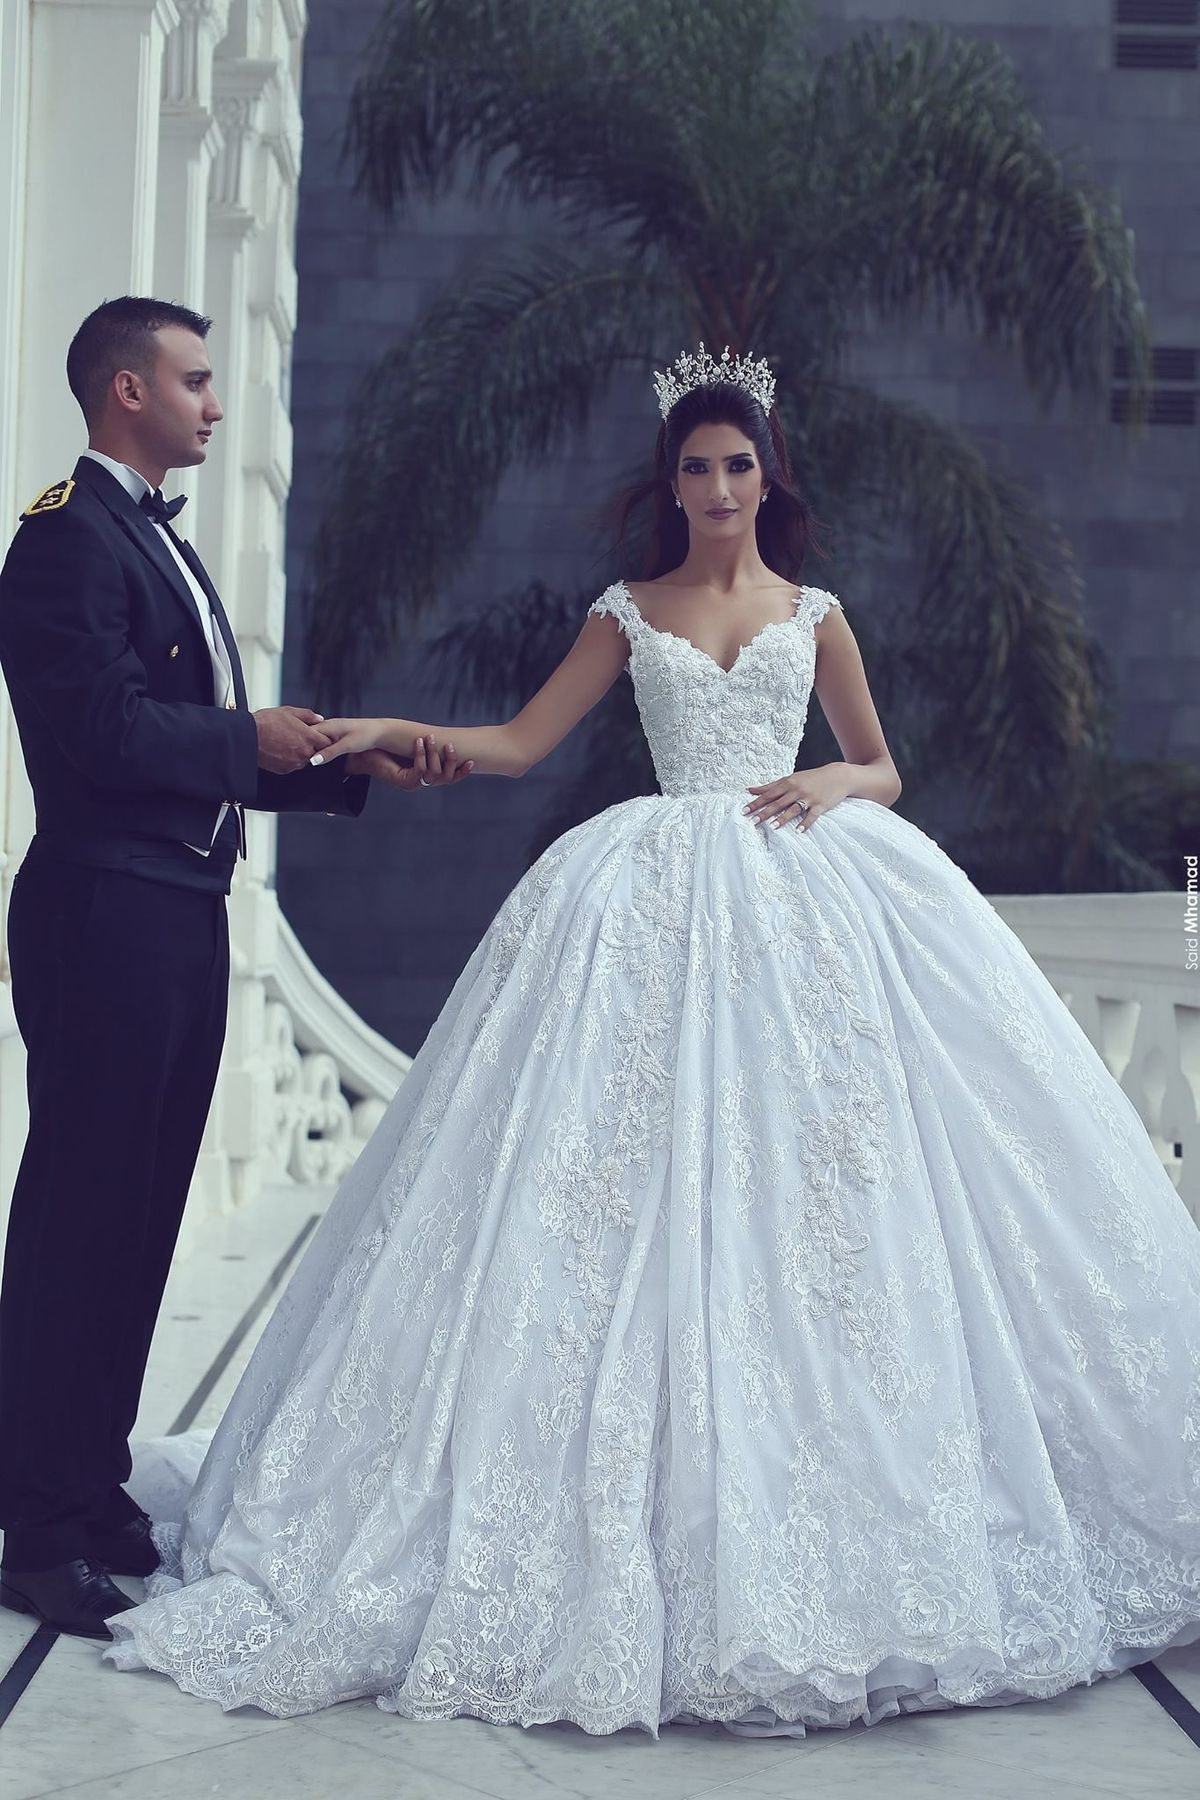 2c8a02fbb4087daa9035574527b5c925.jpg 1,200×1,800 pixels | Wedding ...